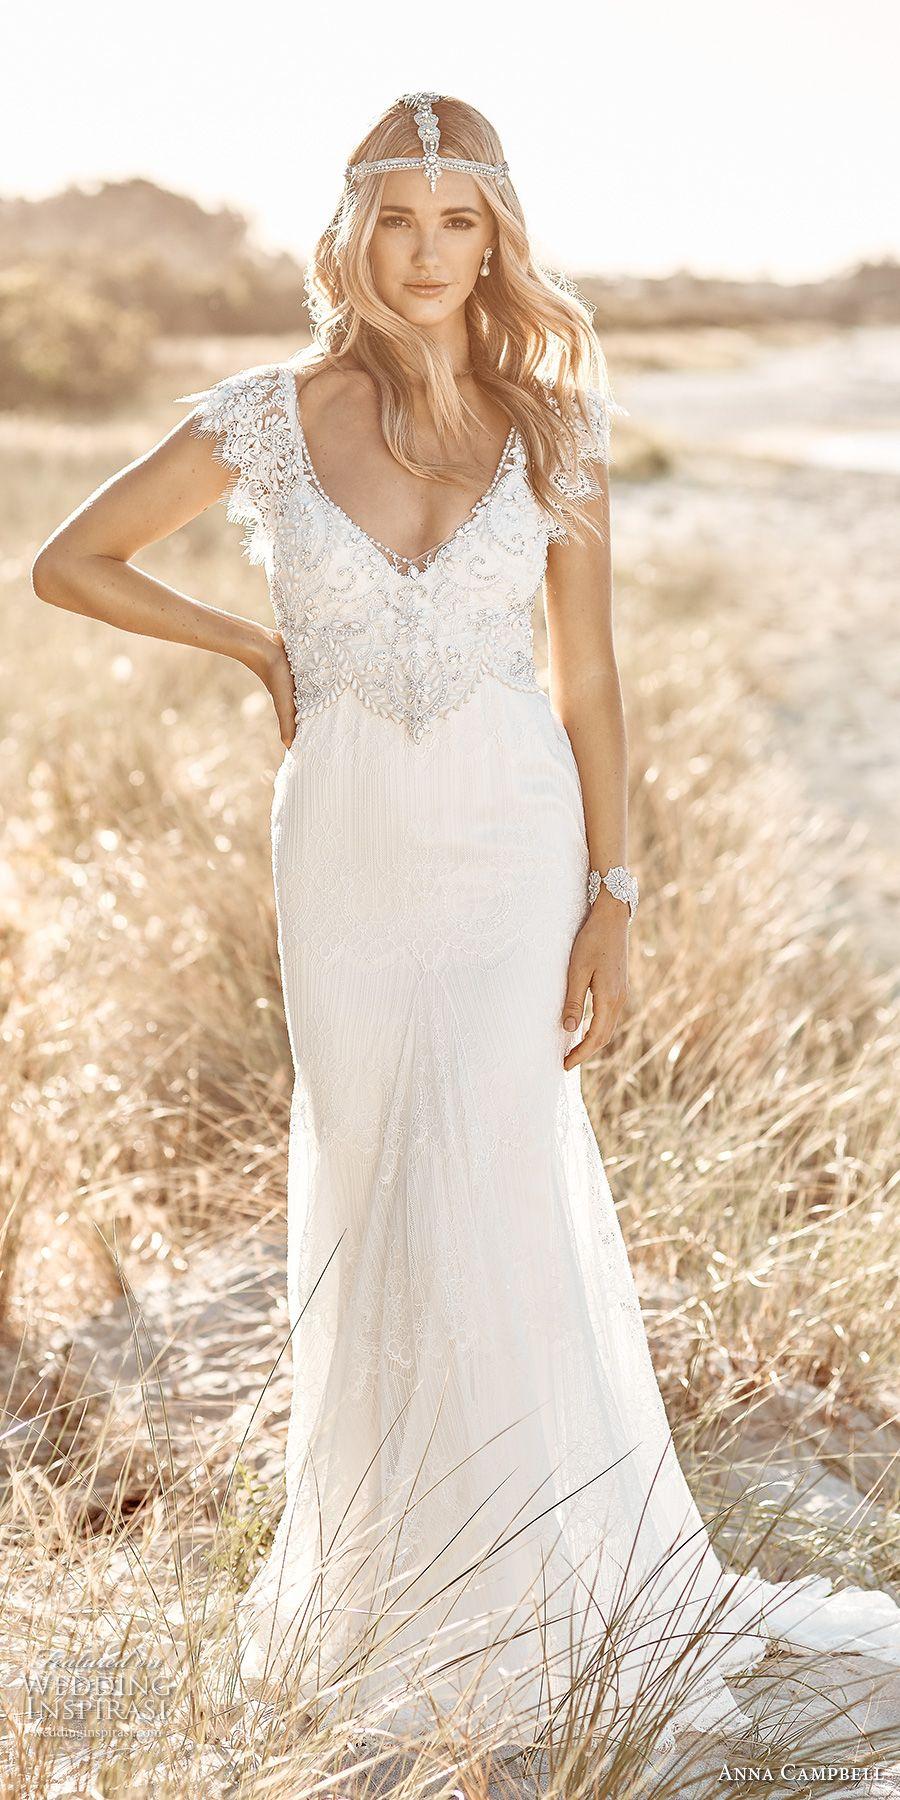 Anna Campbell Wedding Dresses Canada